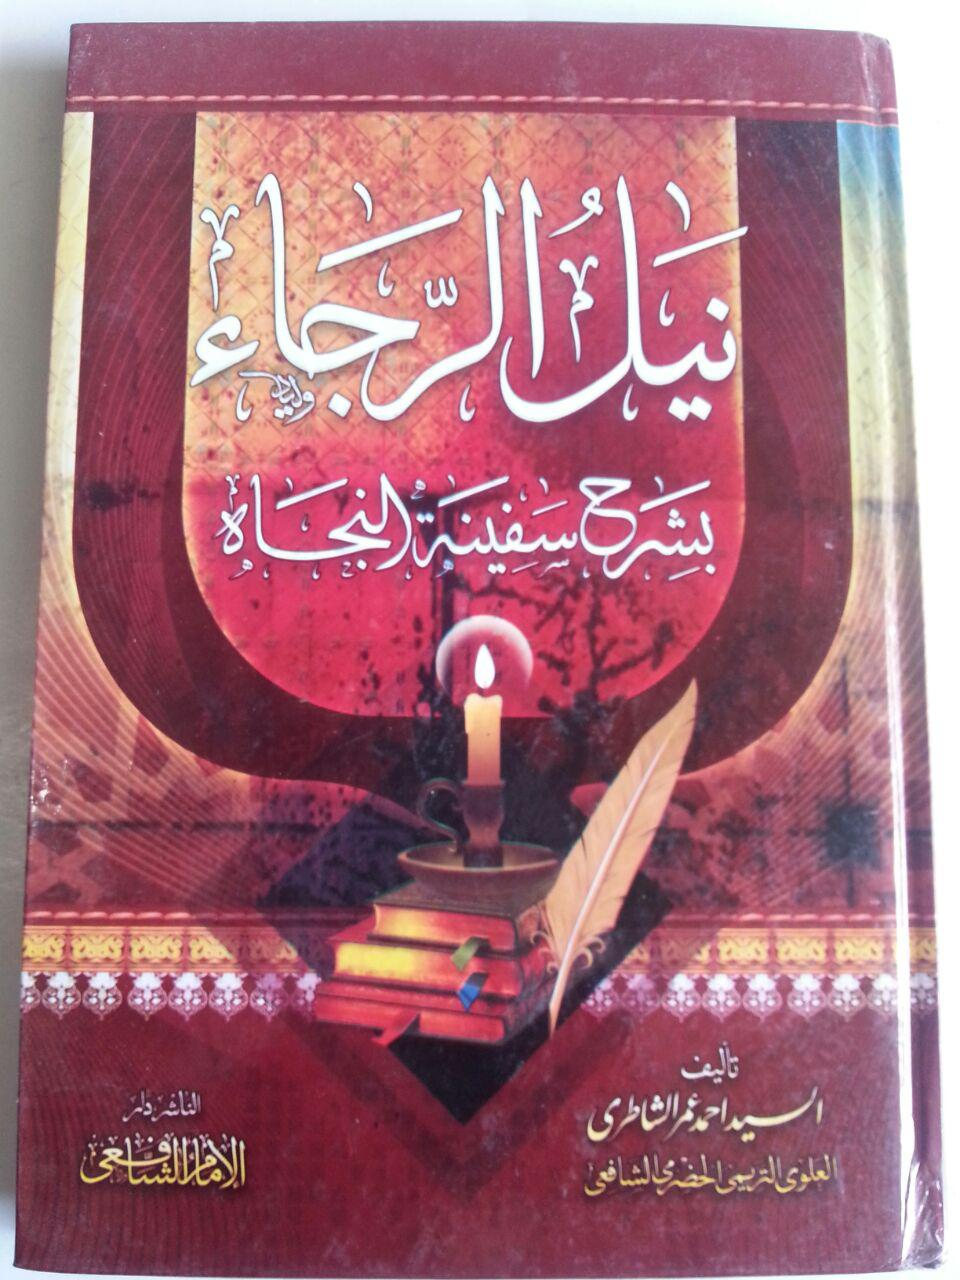 Kitab Nailul Roja Bi Syarh Safinah An-Najah cover 2